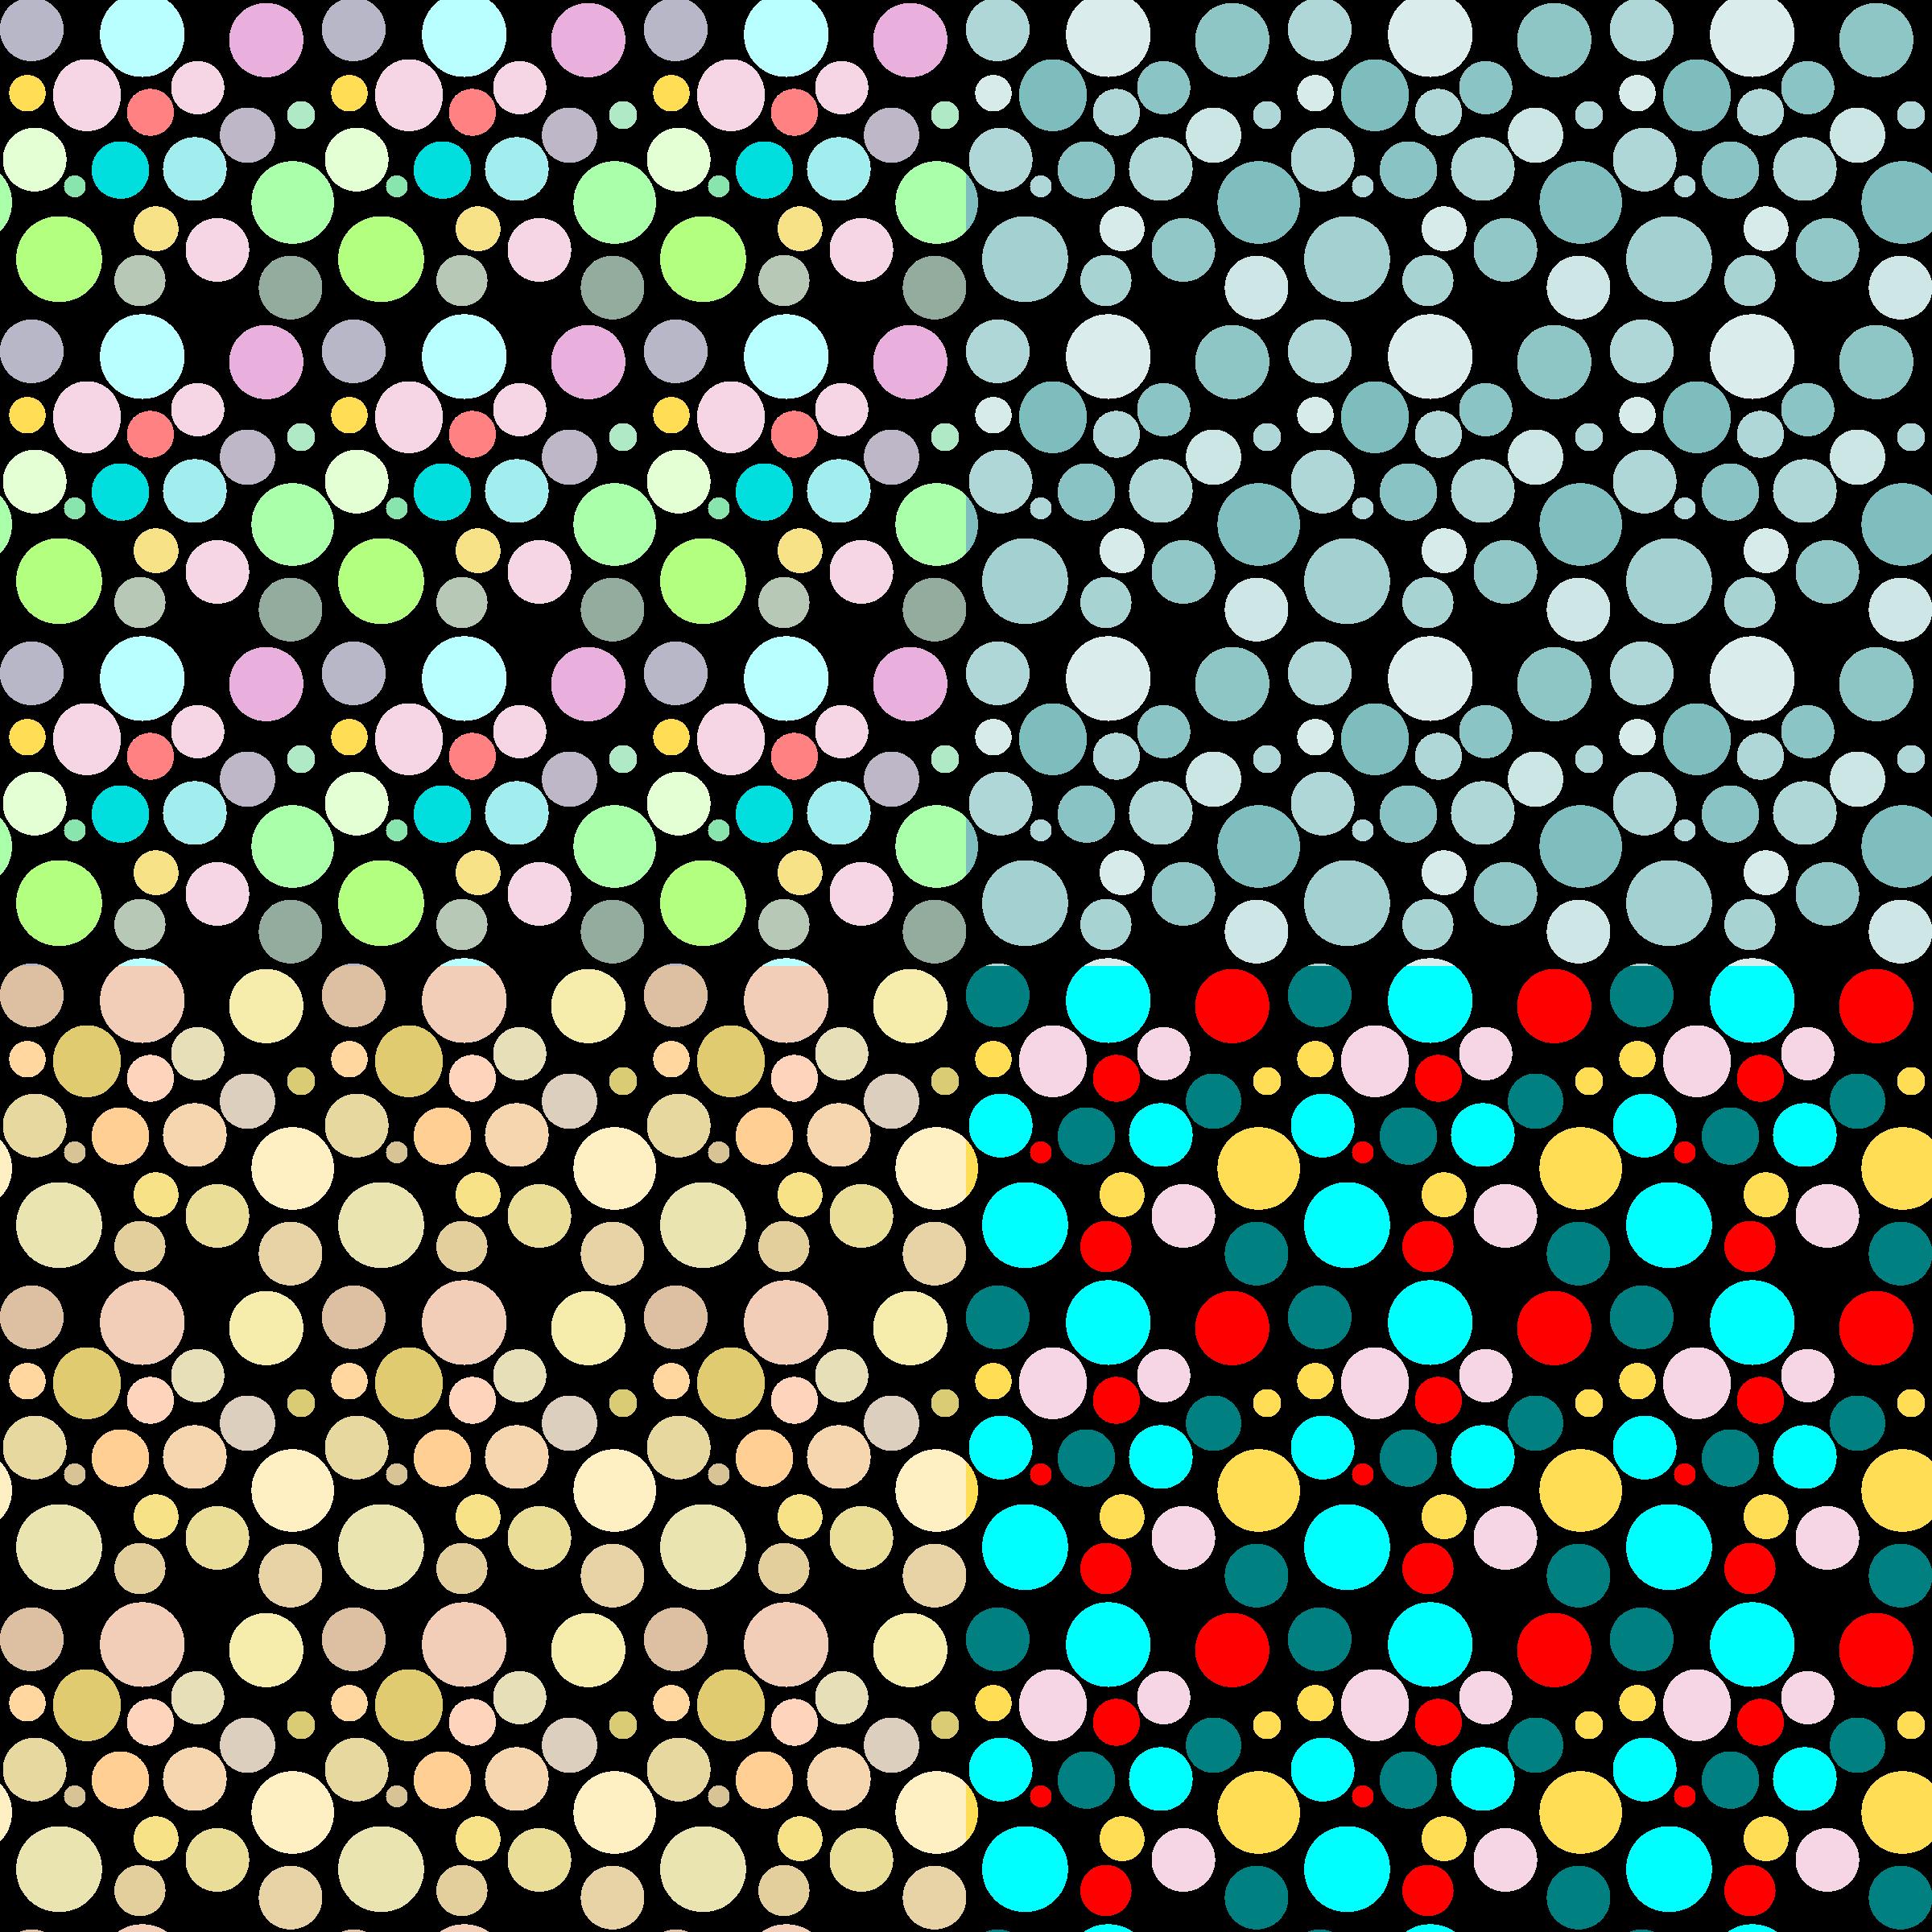 Circle patterns. Dot clipart four